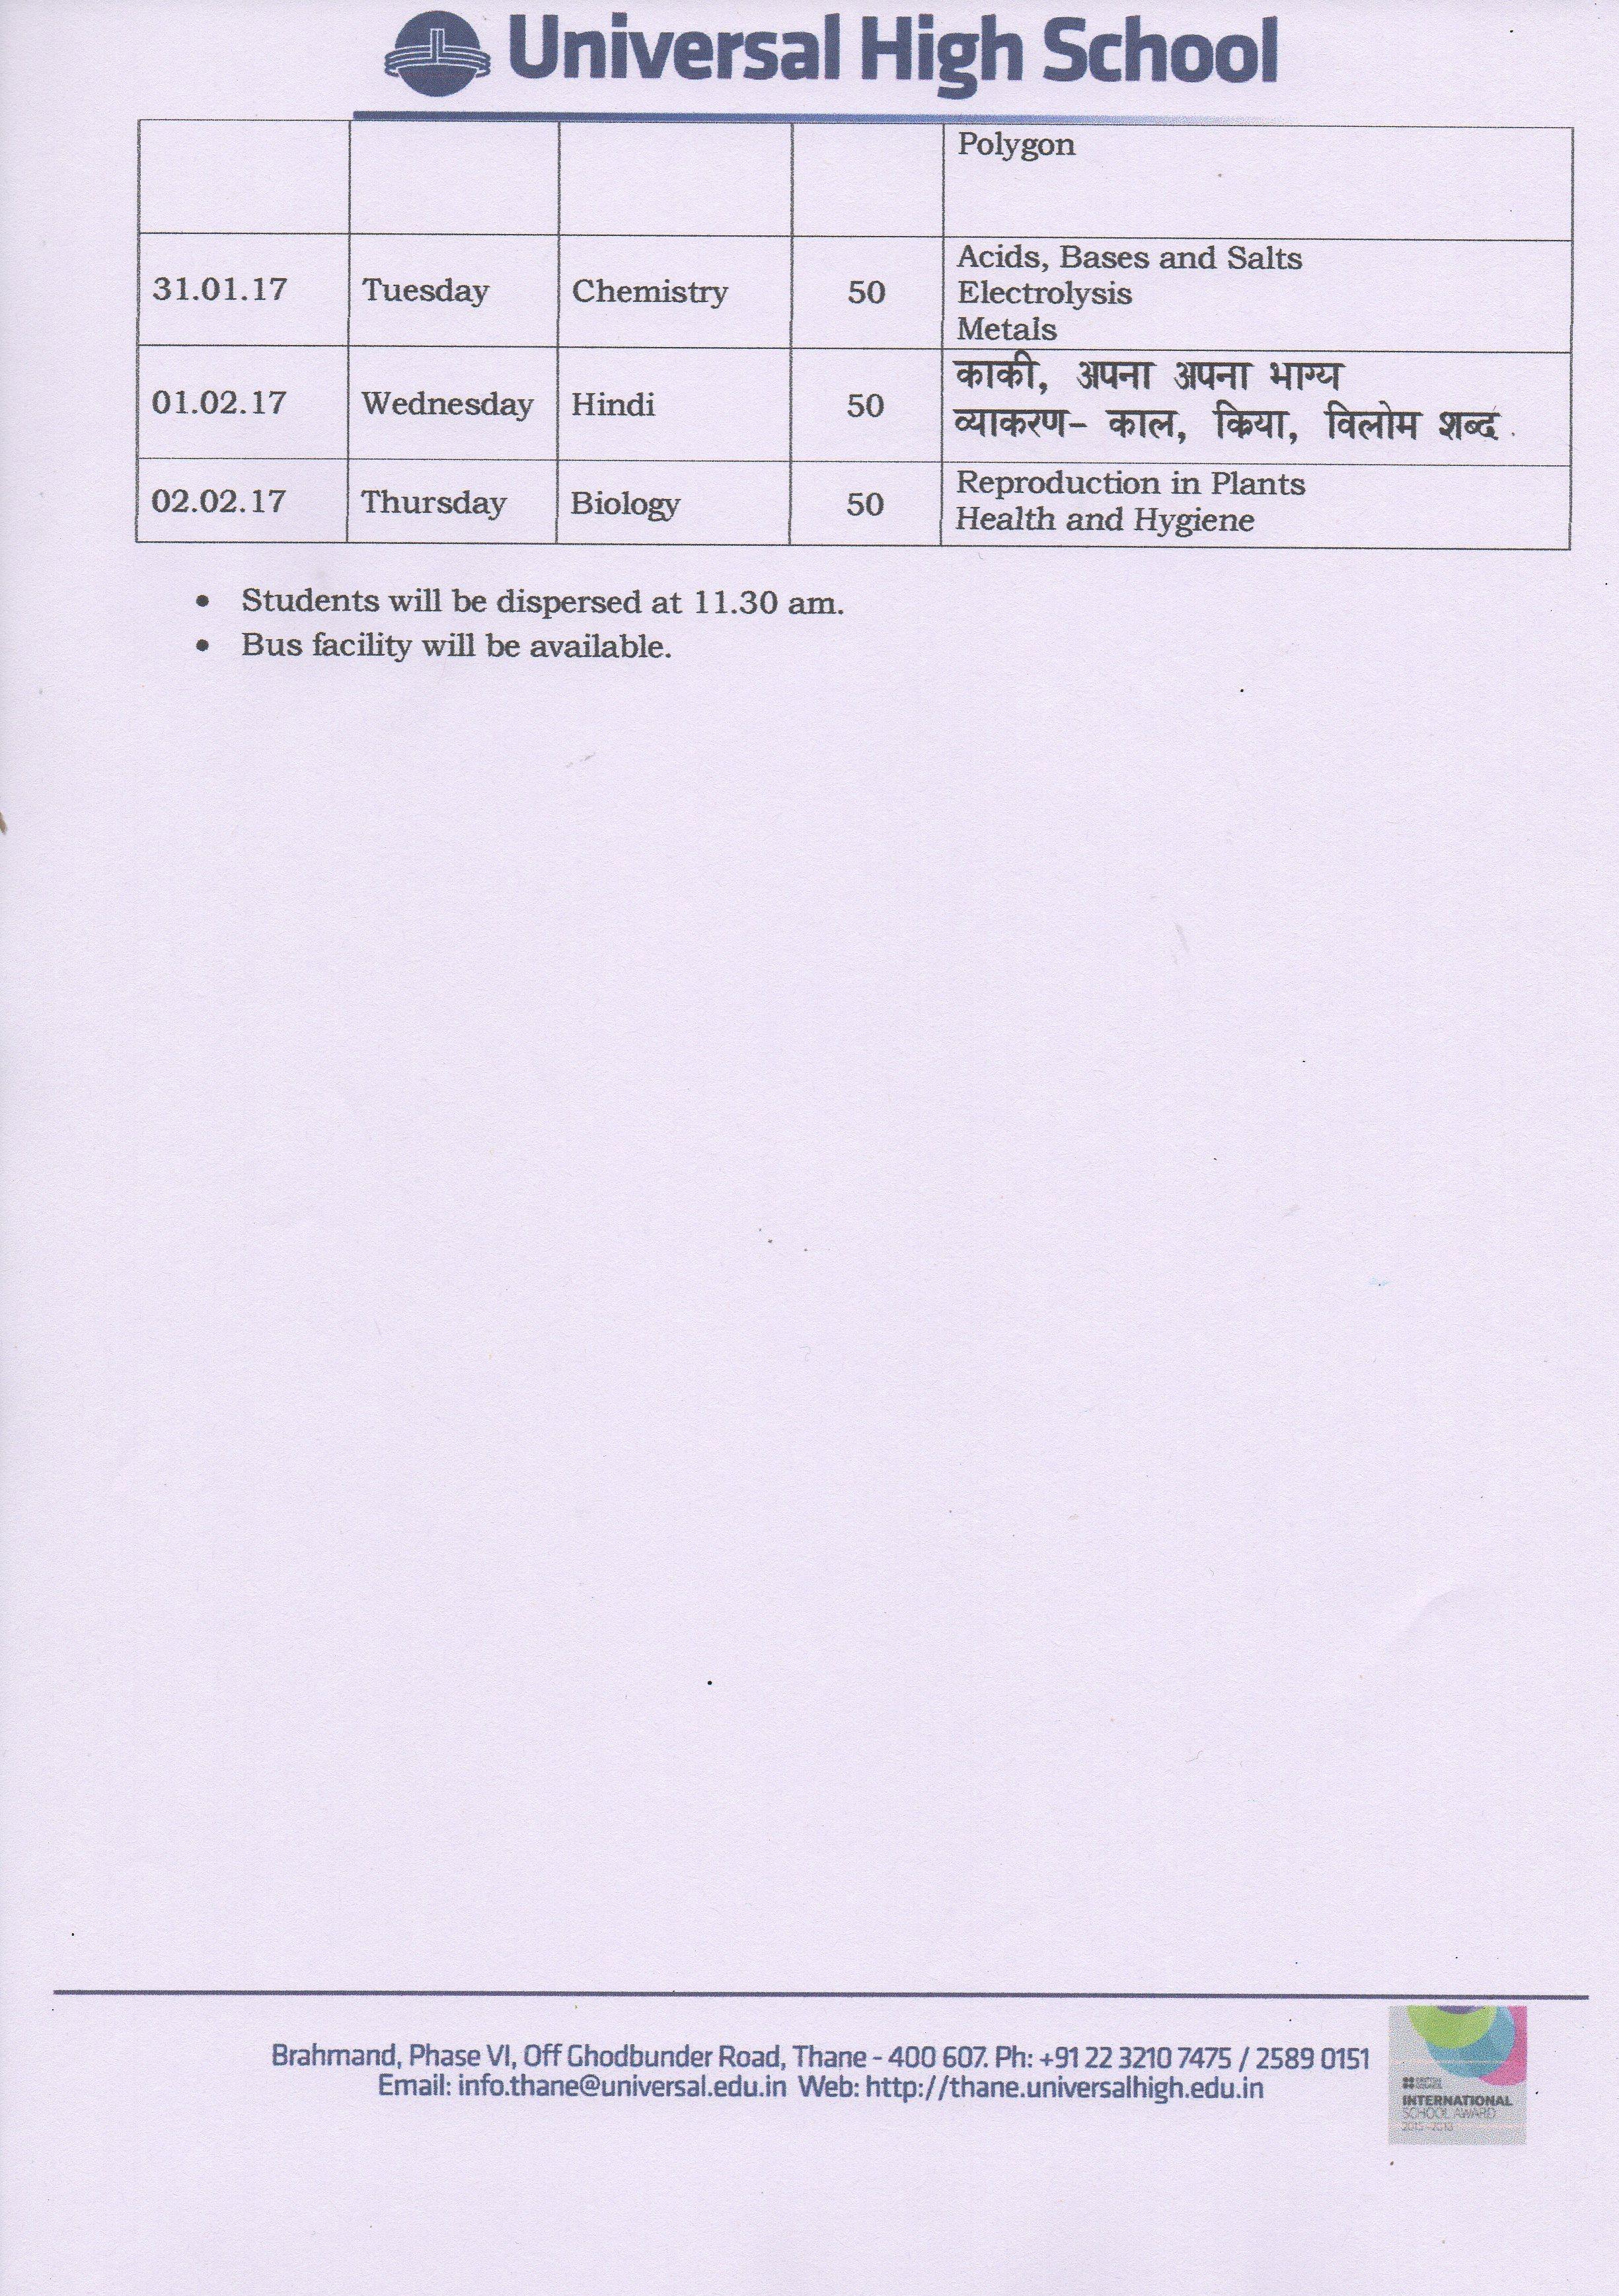 Grade VIII Term II CCE2 Schedule 2016-2017